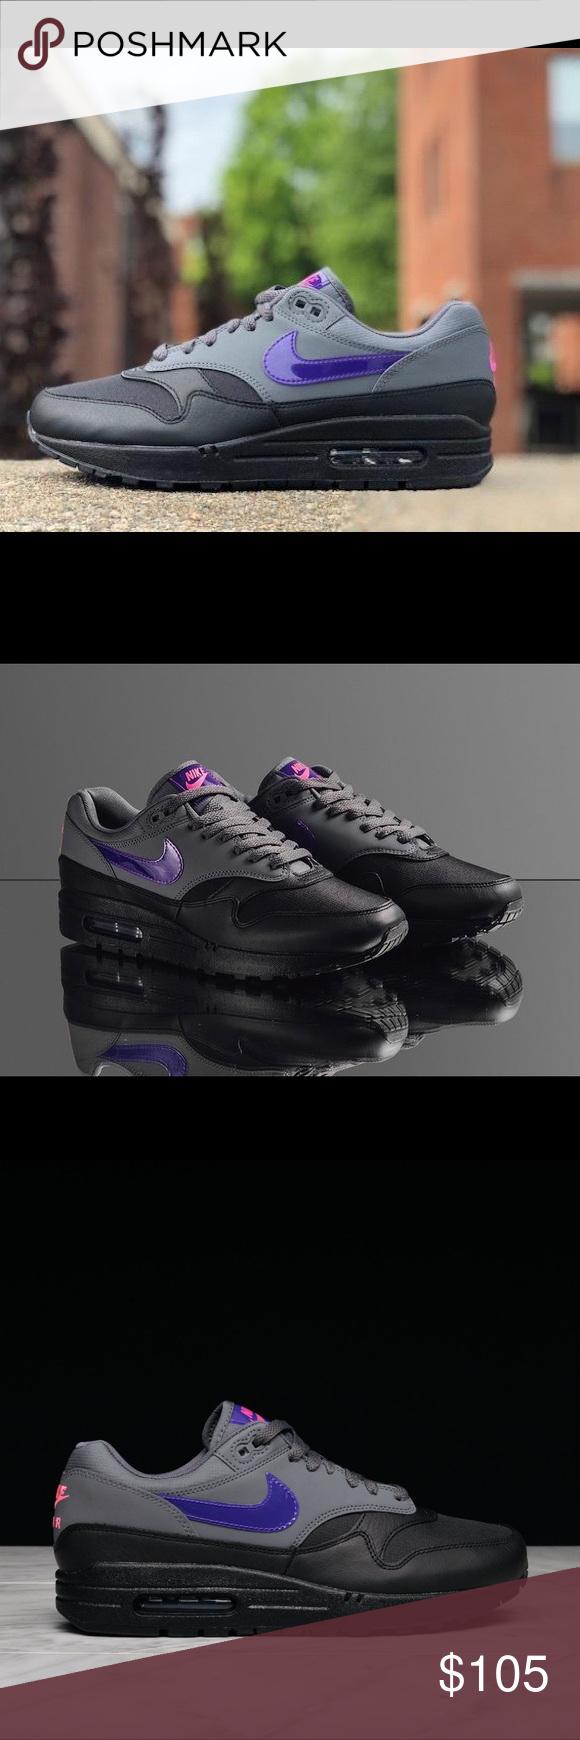 Nike Air Max 1 Dark GreyFierce Purple